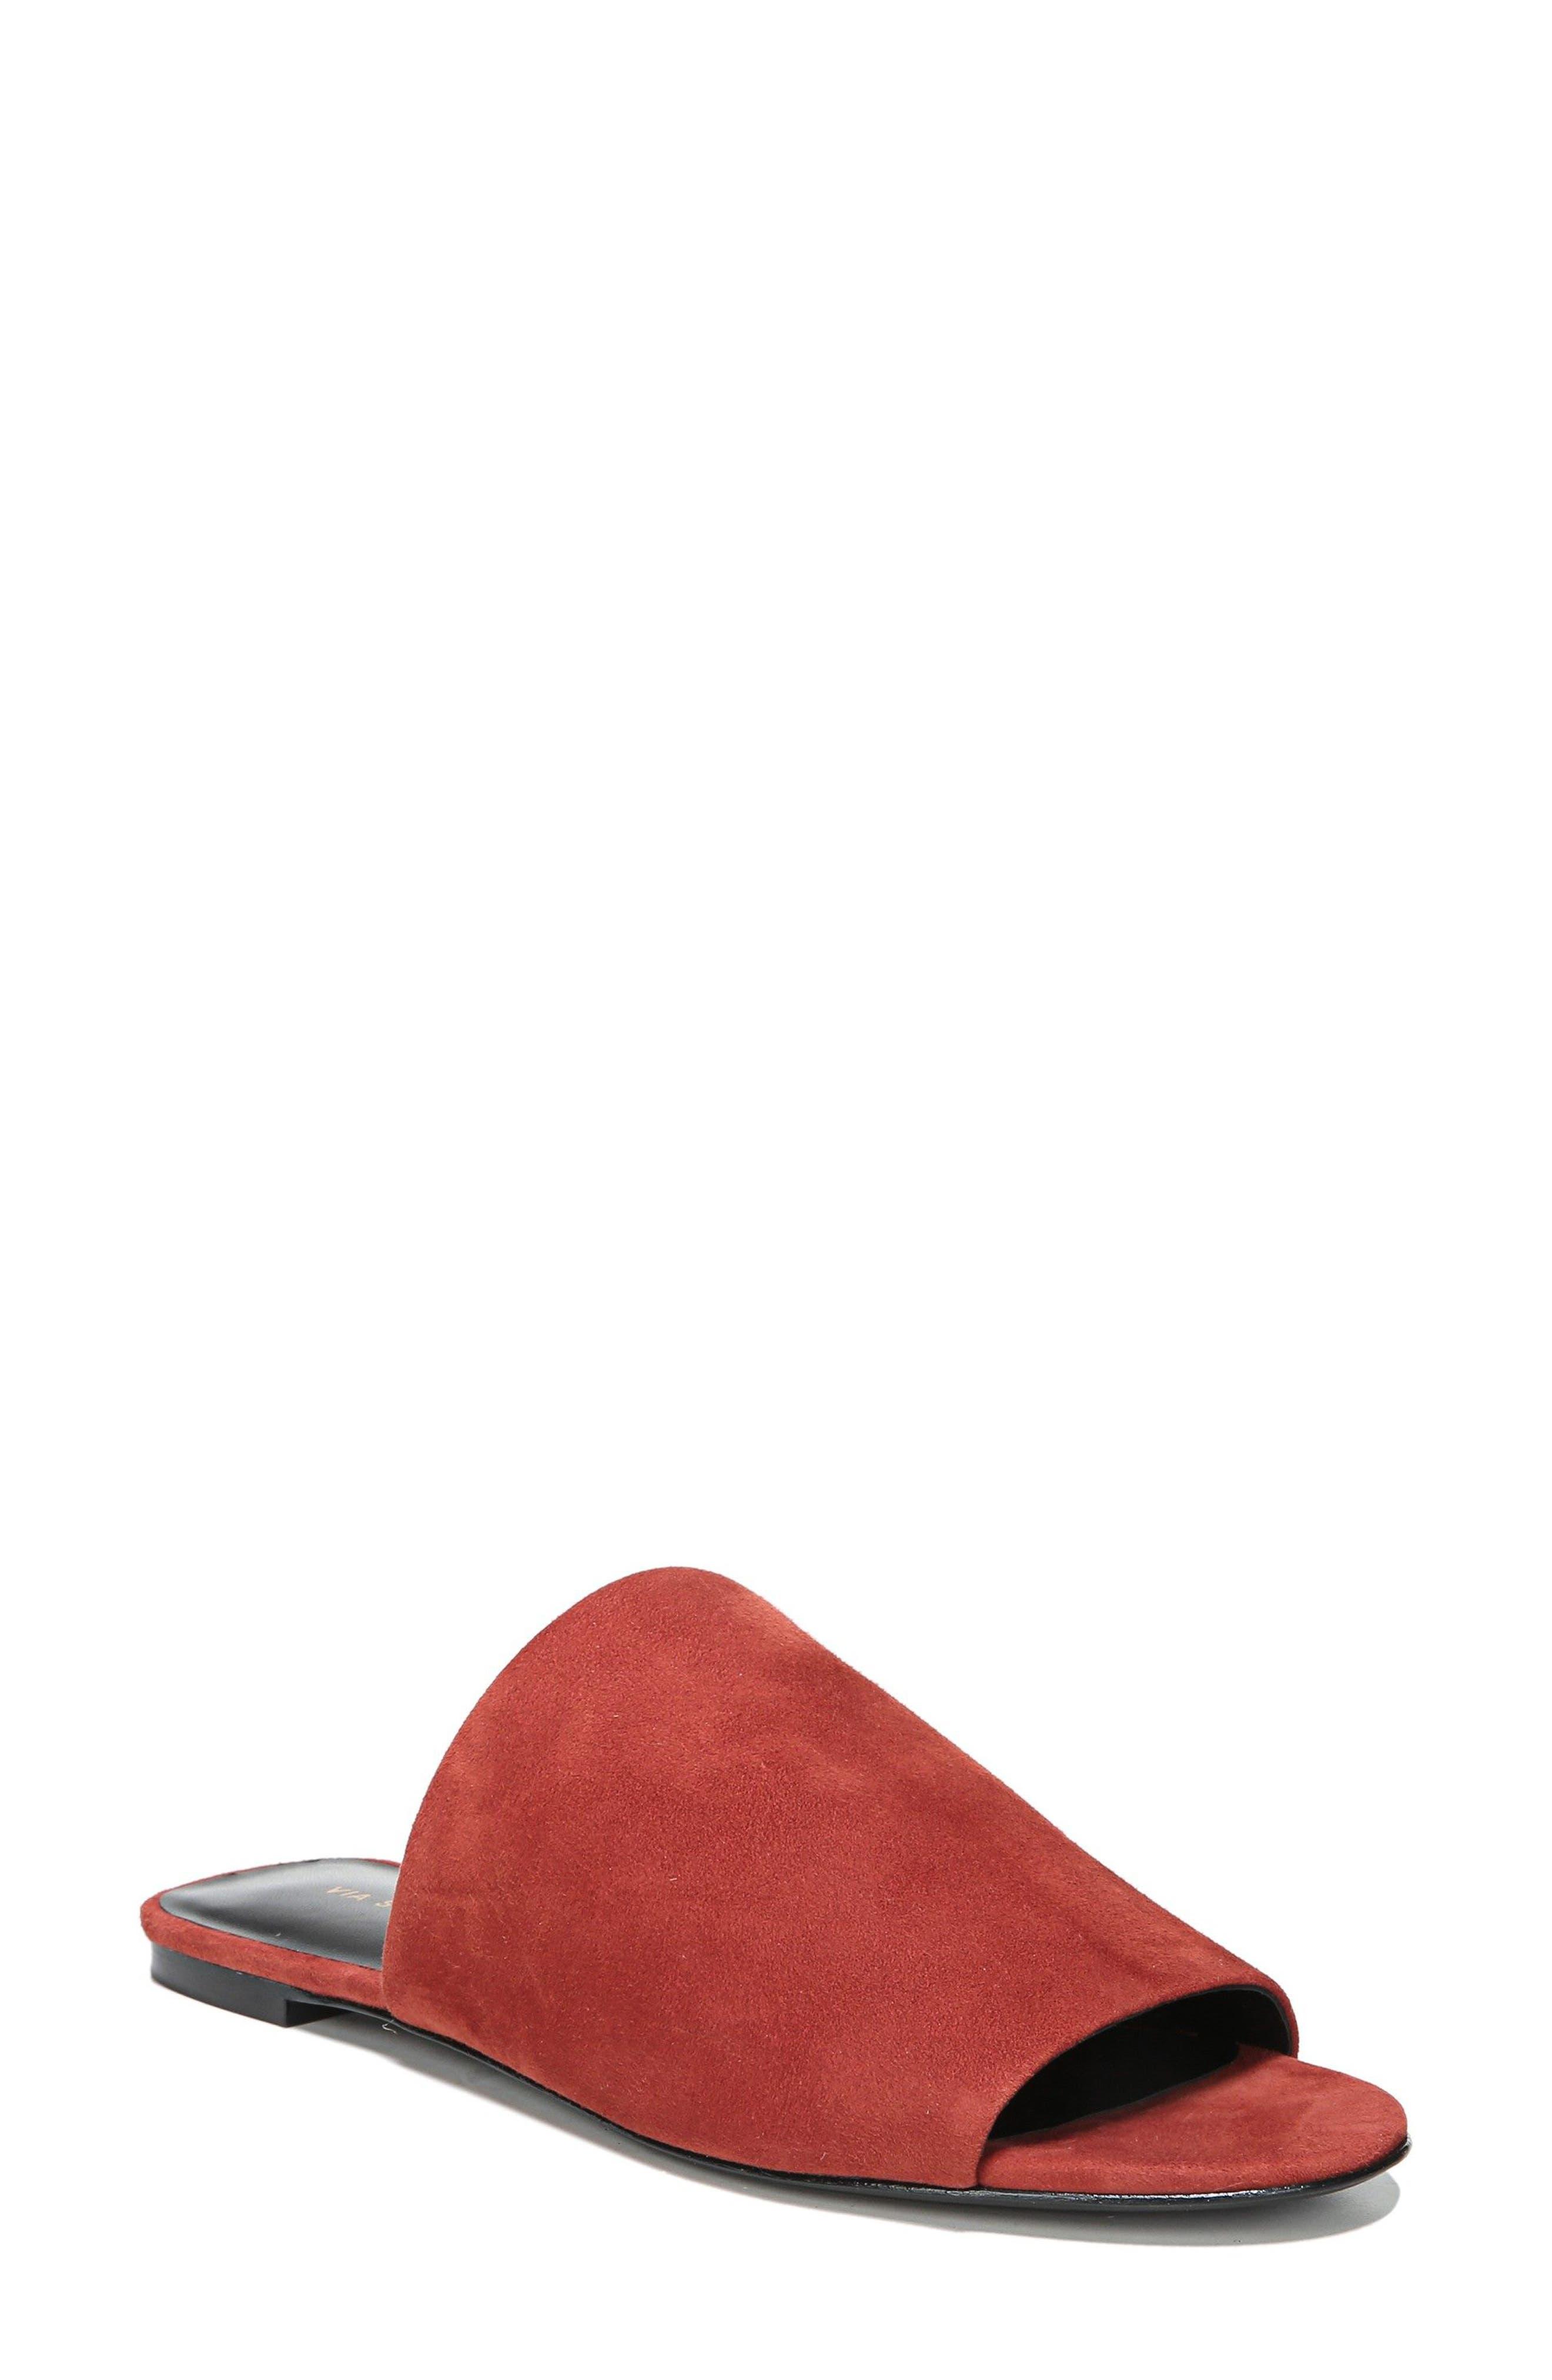 Heather Slide Sandal,                         Main,                         color, Brick Leather